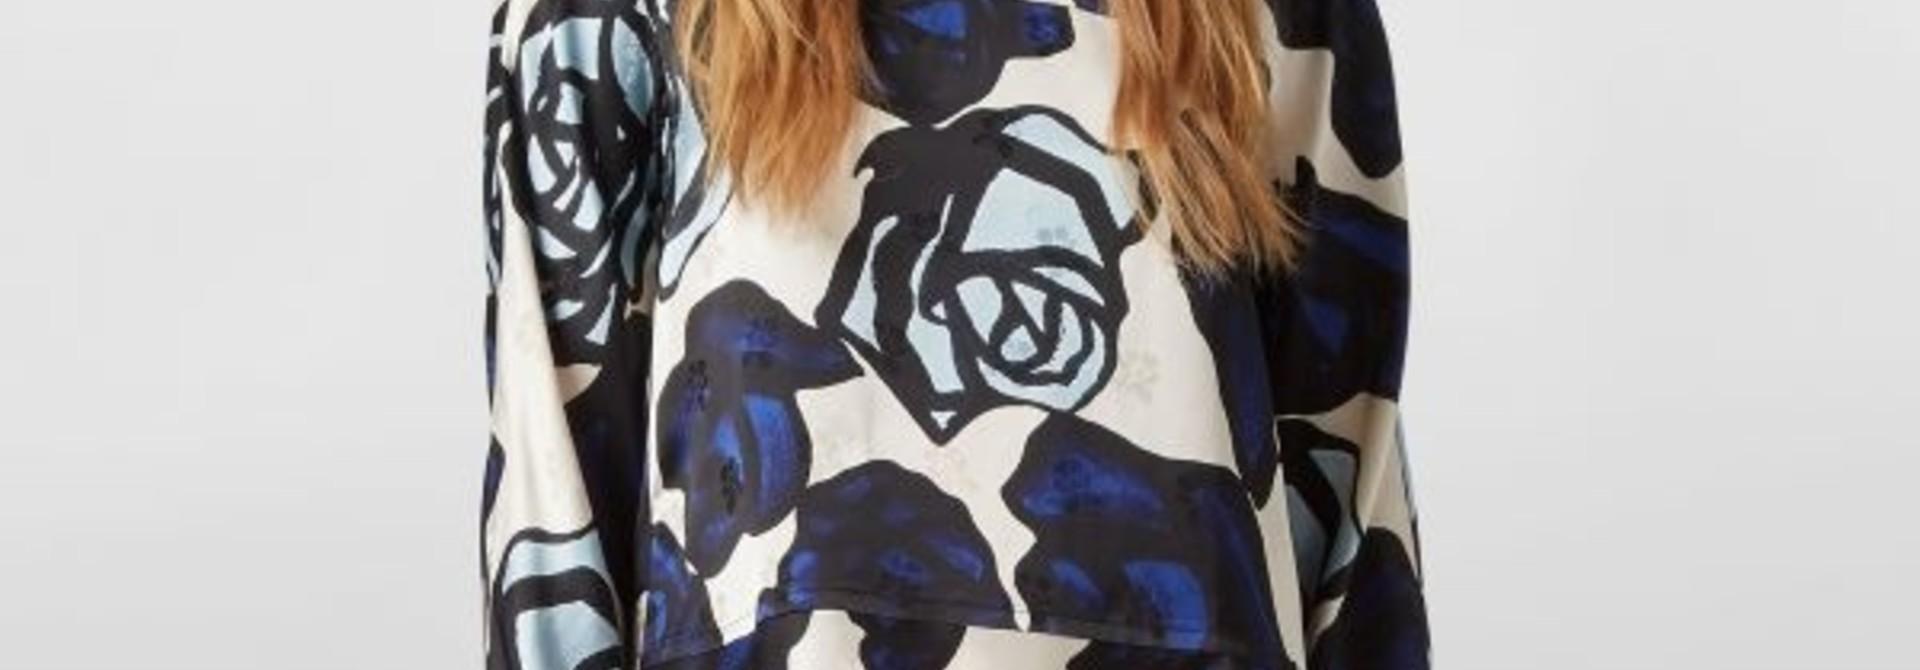 Blouse - Blu/Blk Rose - Sz 42